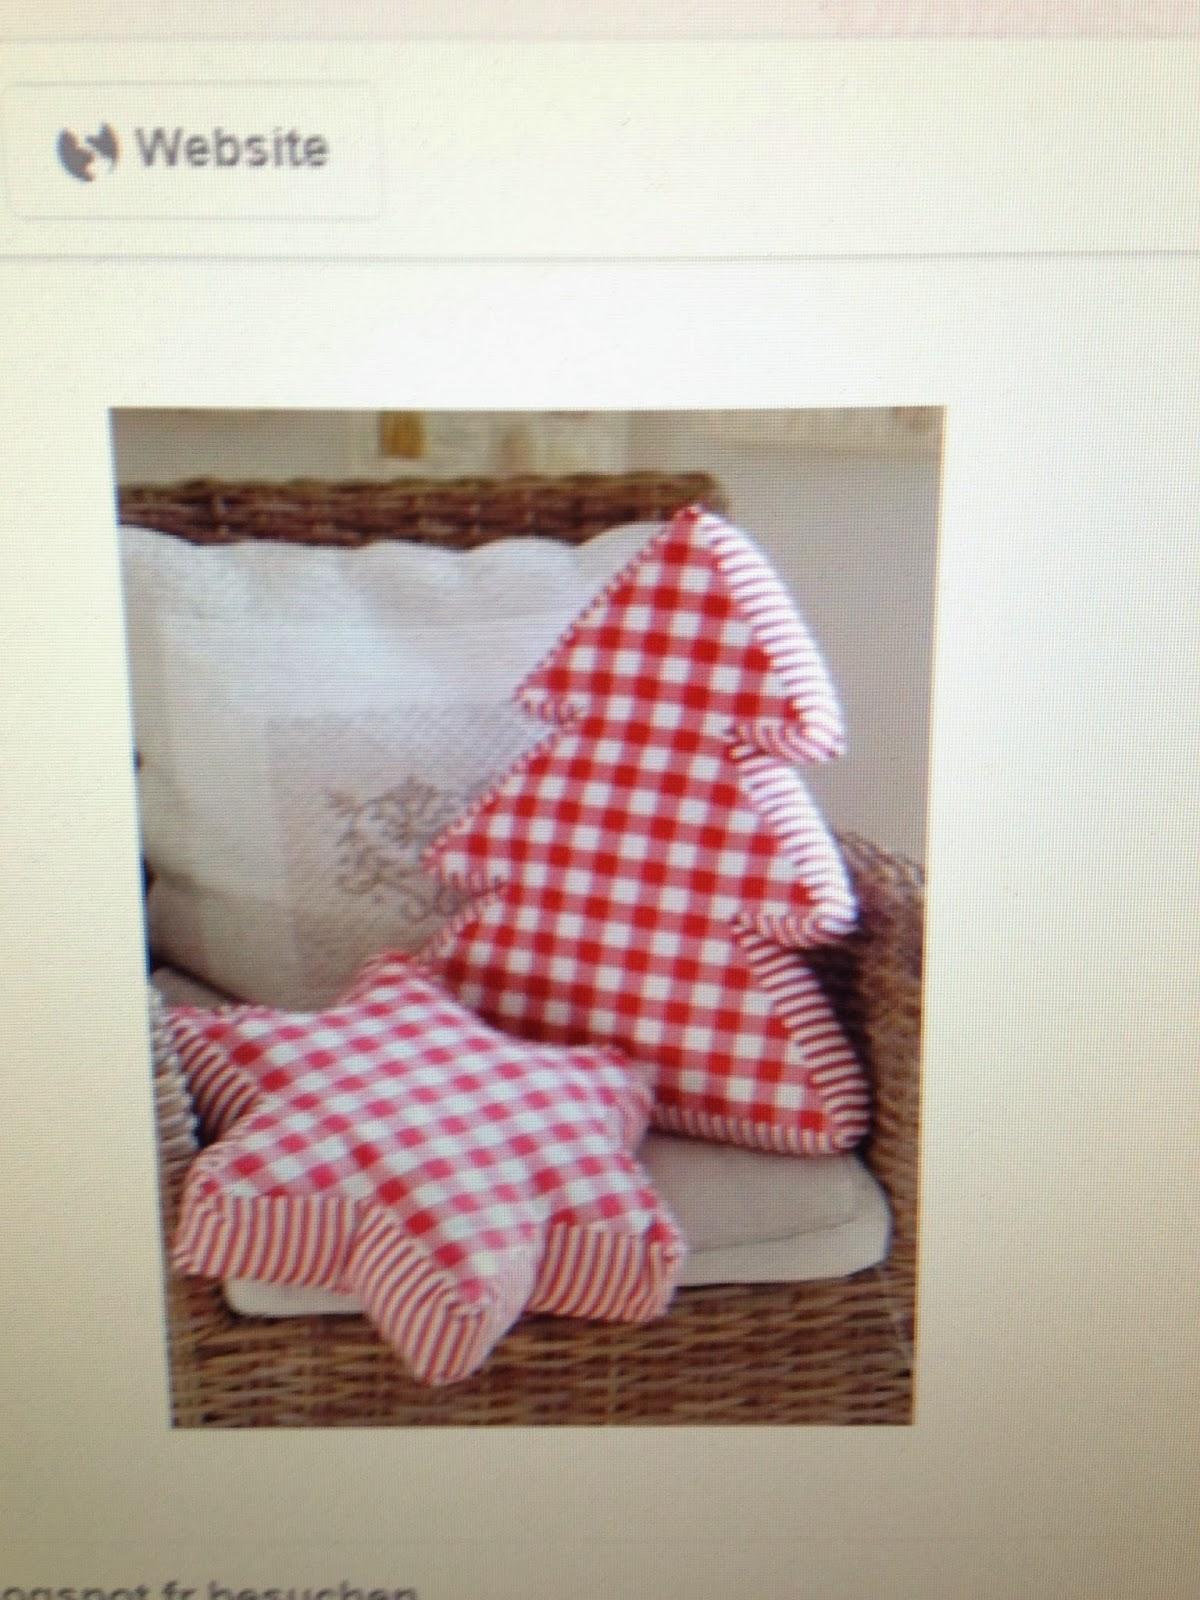 rogge n mehl kissen kann man immer gebrauchen 2 teil. Black Bedroom Furniture Sets. Home Design Ideas